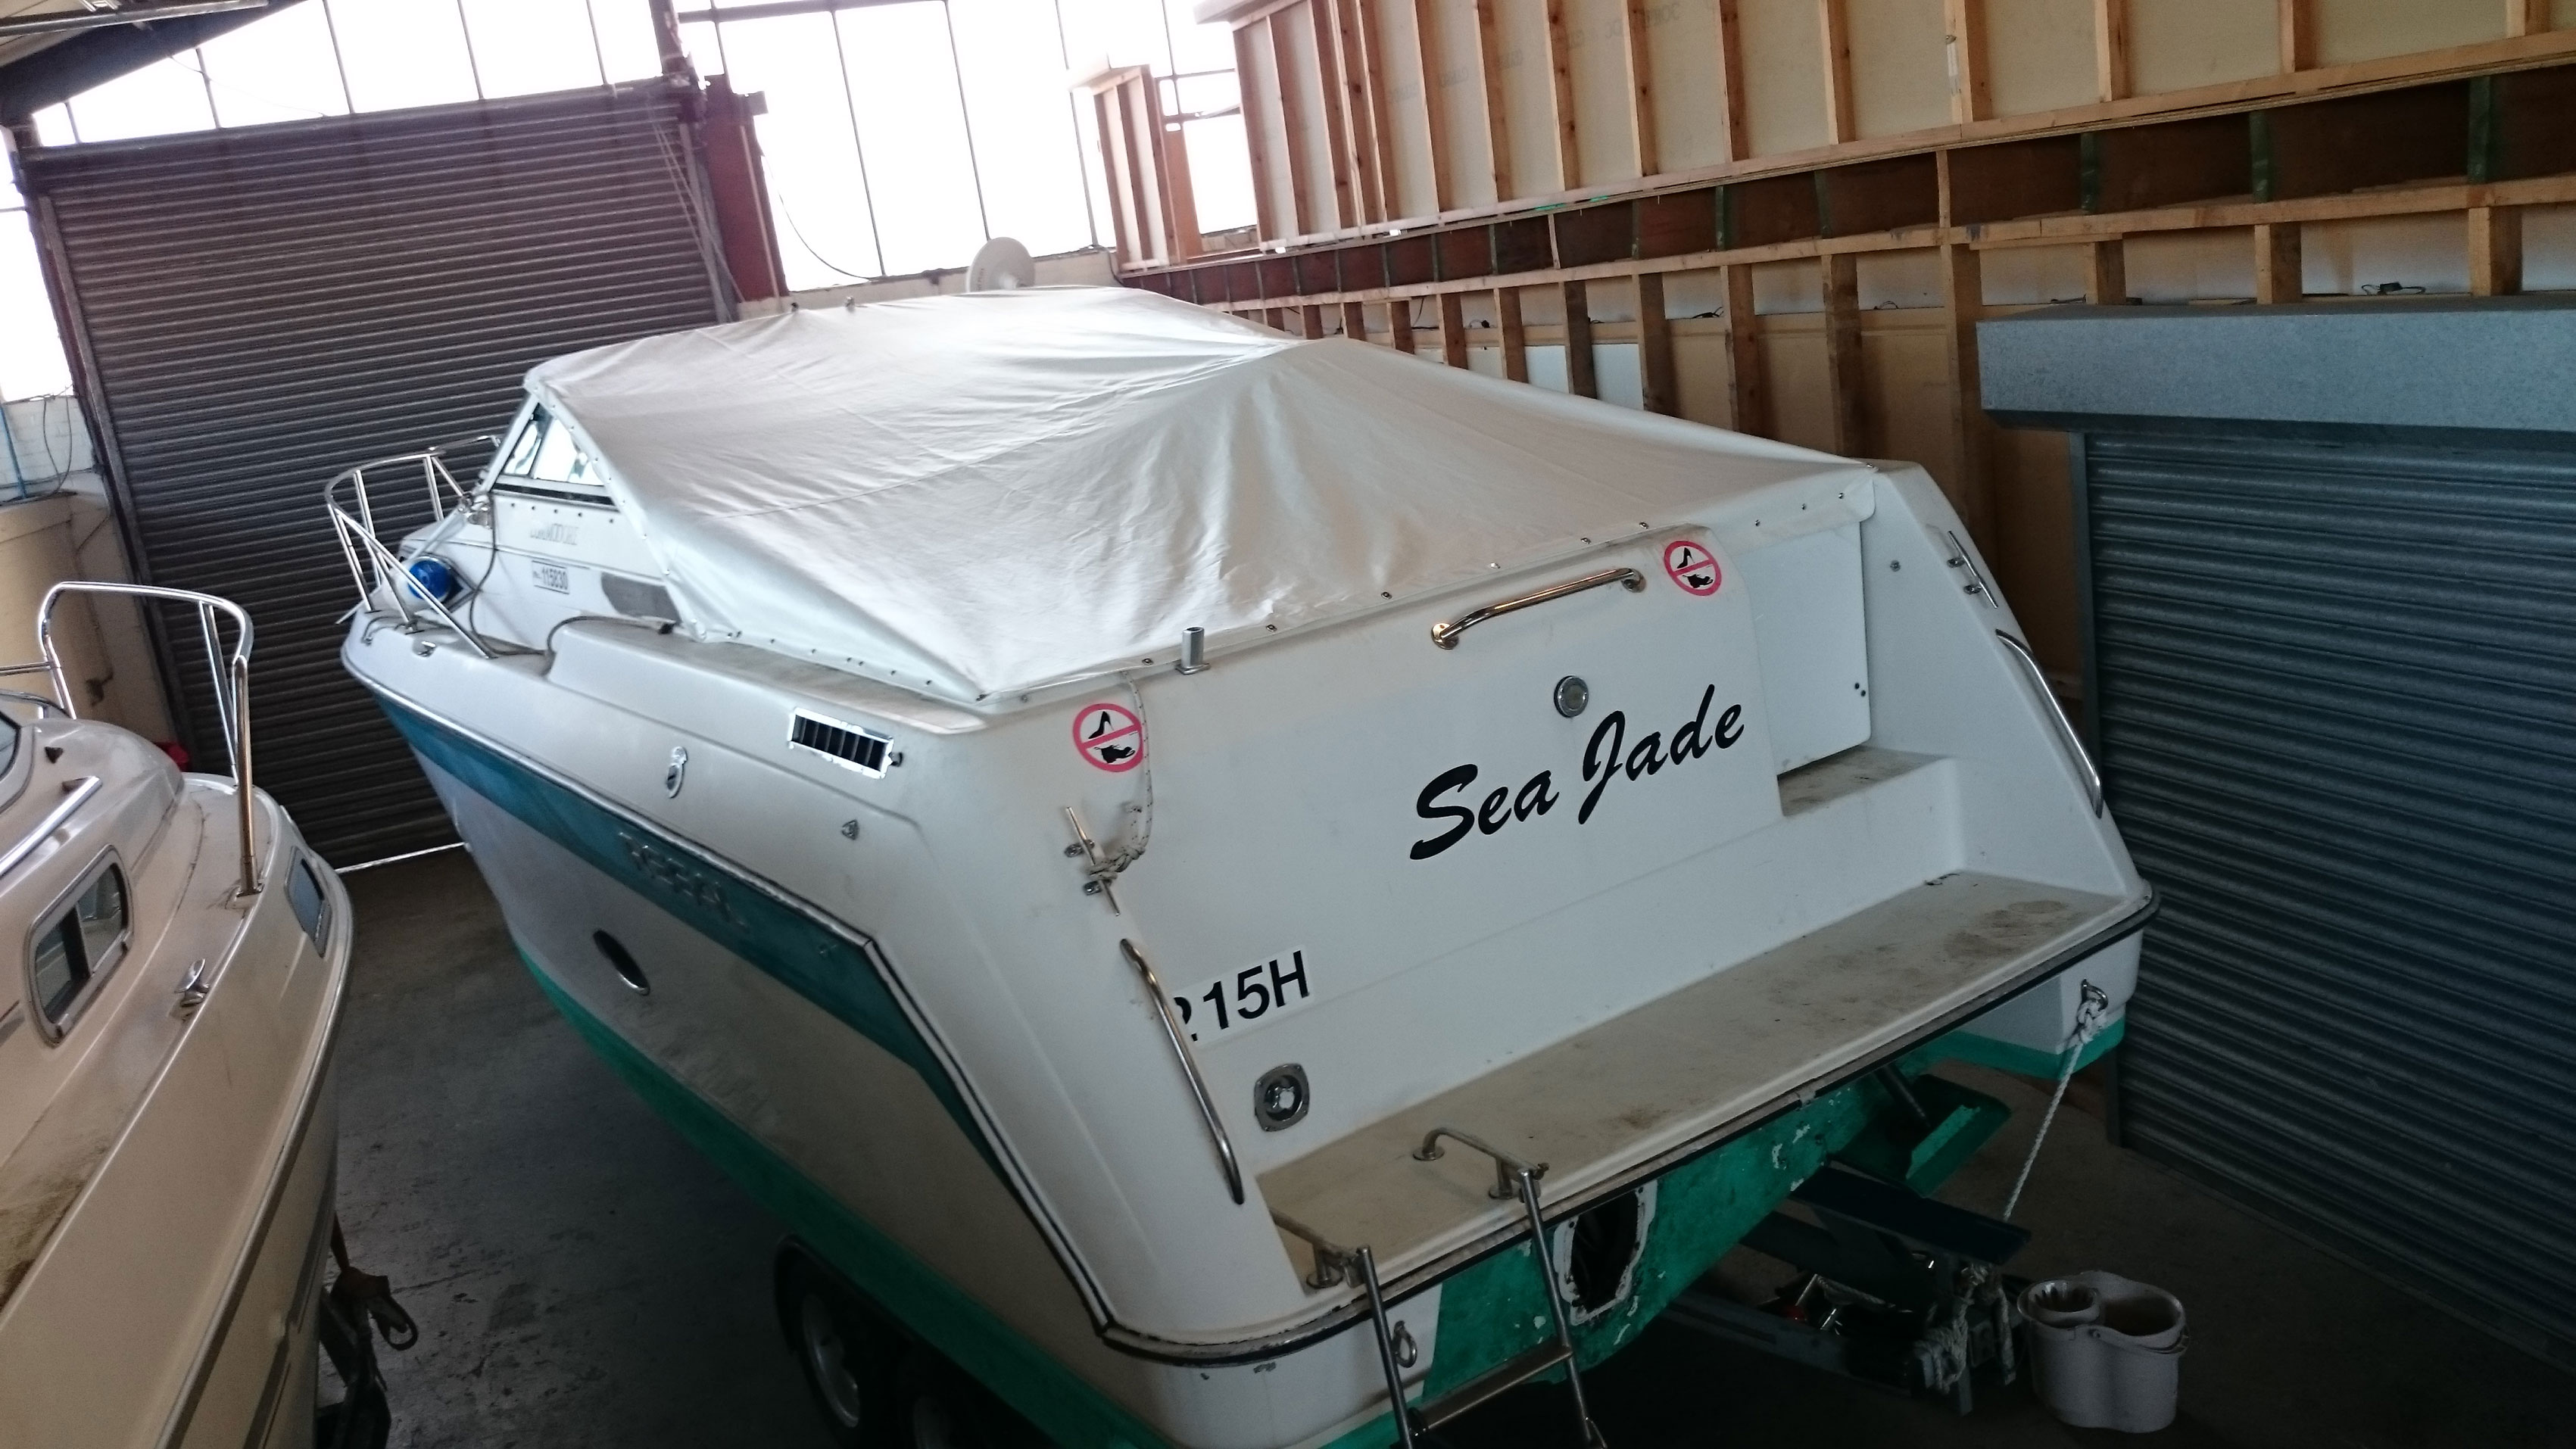 Sea-Jade-Boat-Cover-3